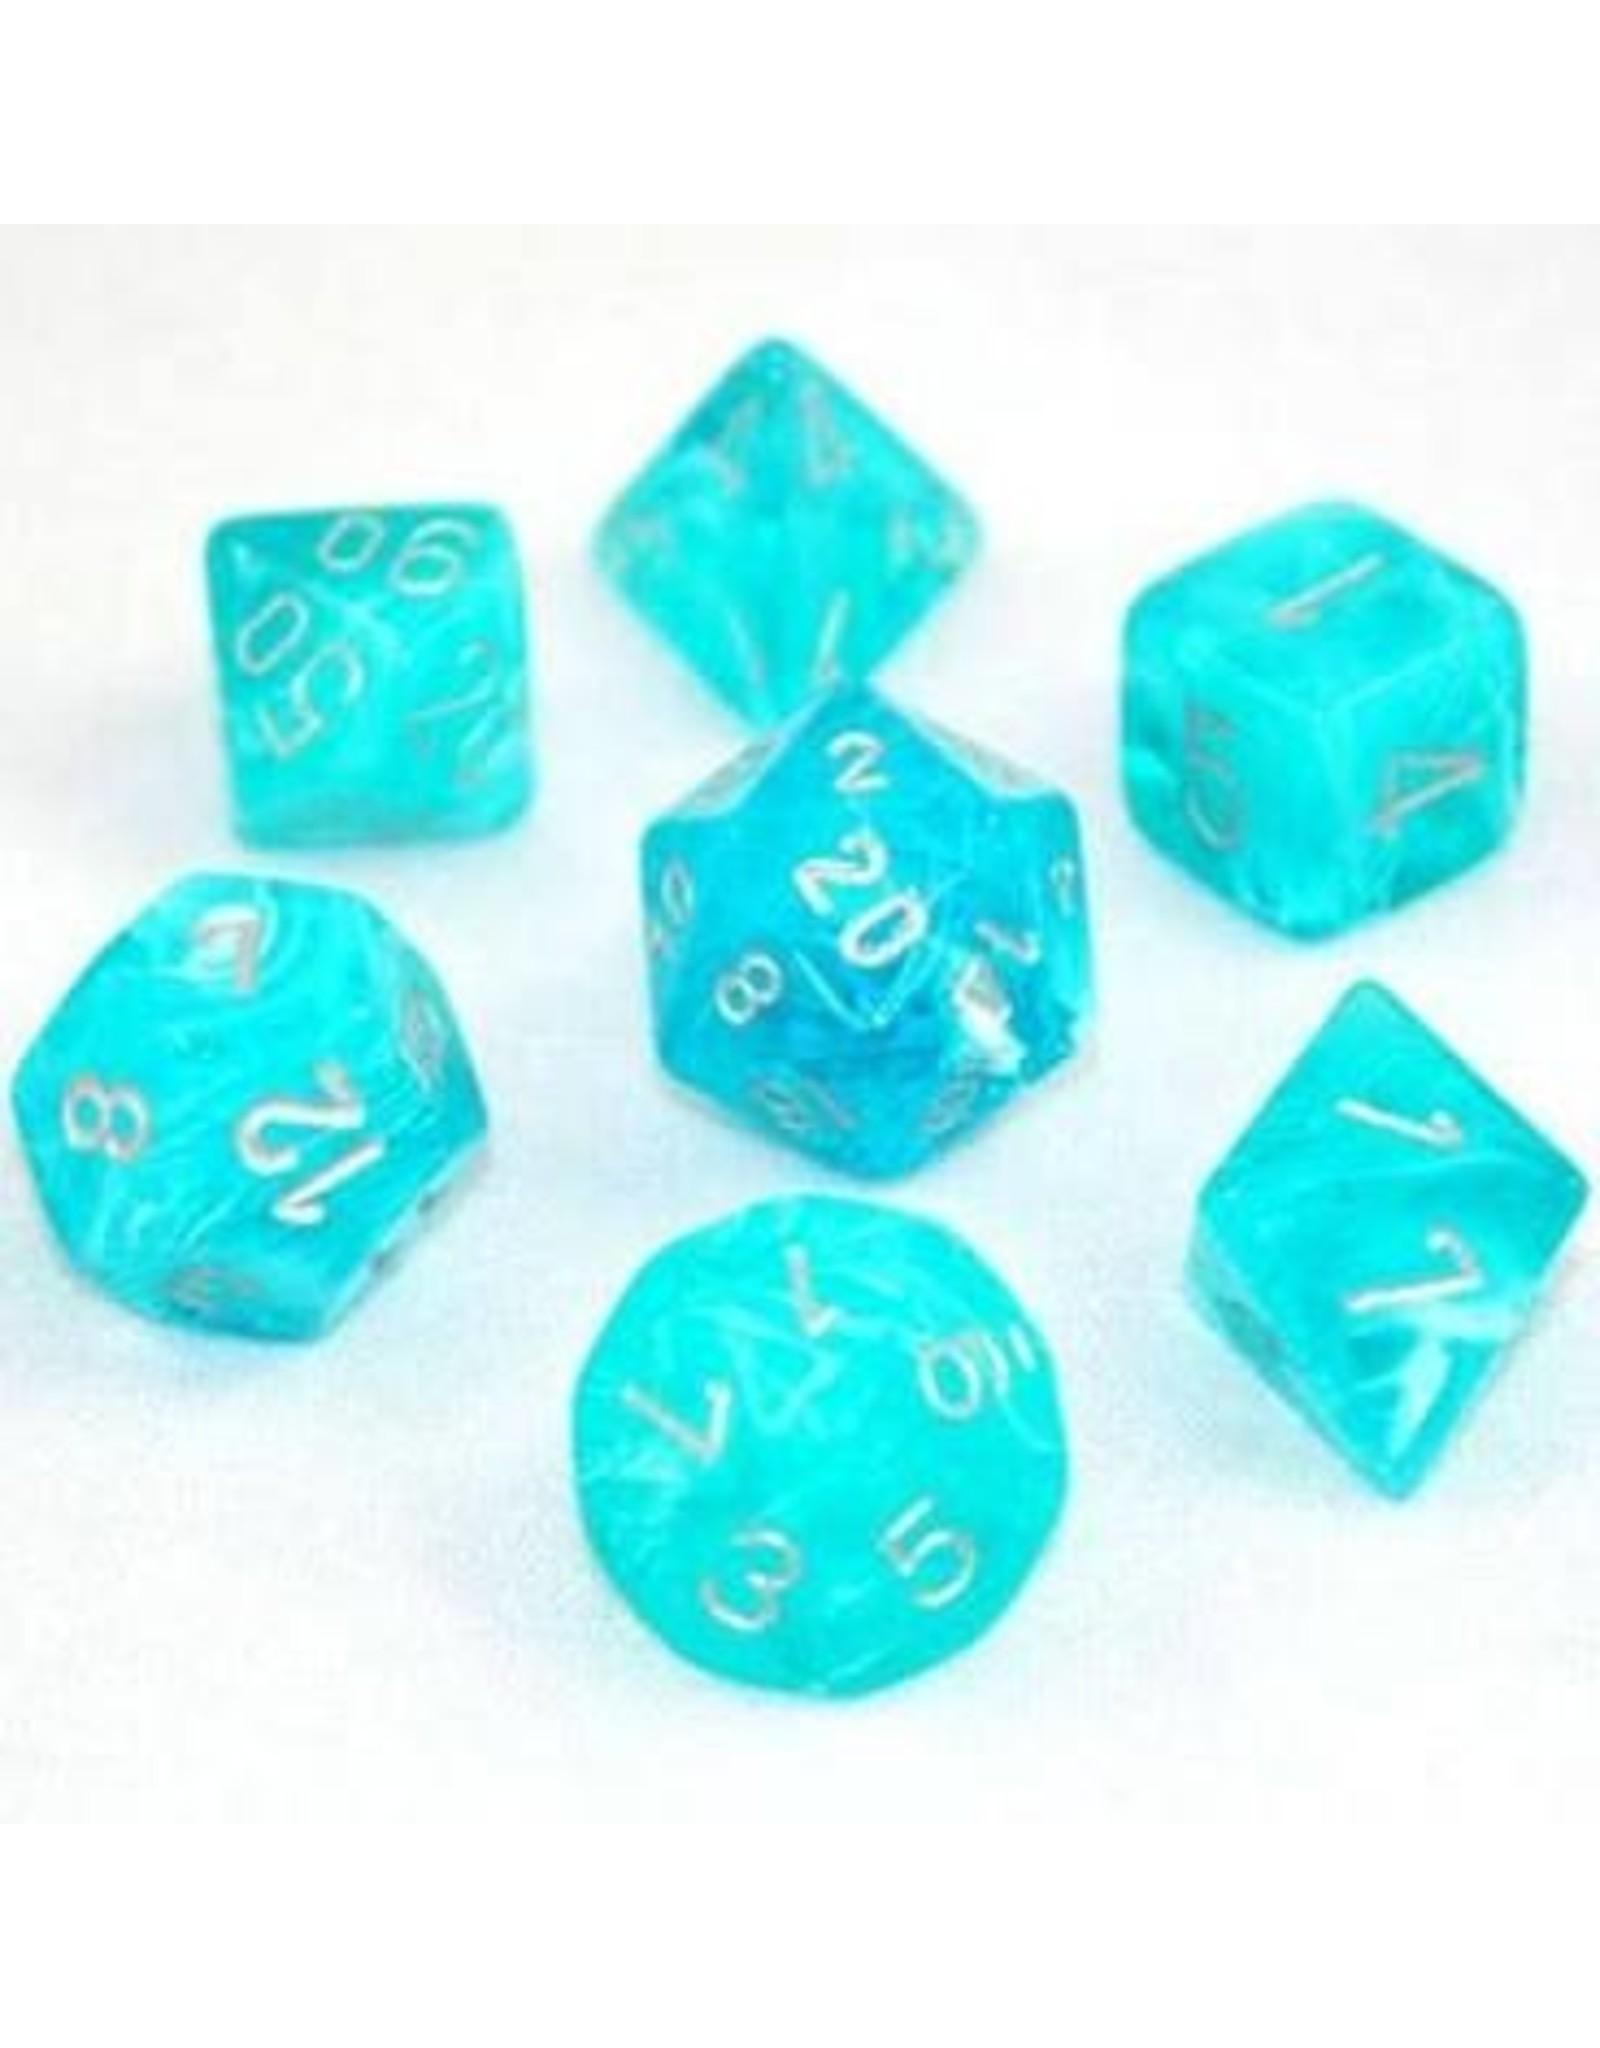 Chessex 7-Set Polyhedral Cirrus Polyhedral Set, Aqua/Sl